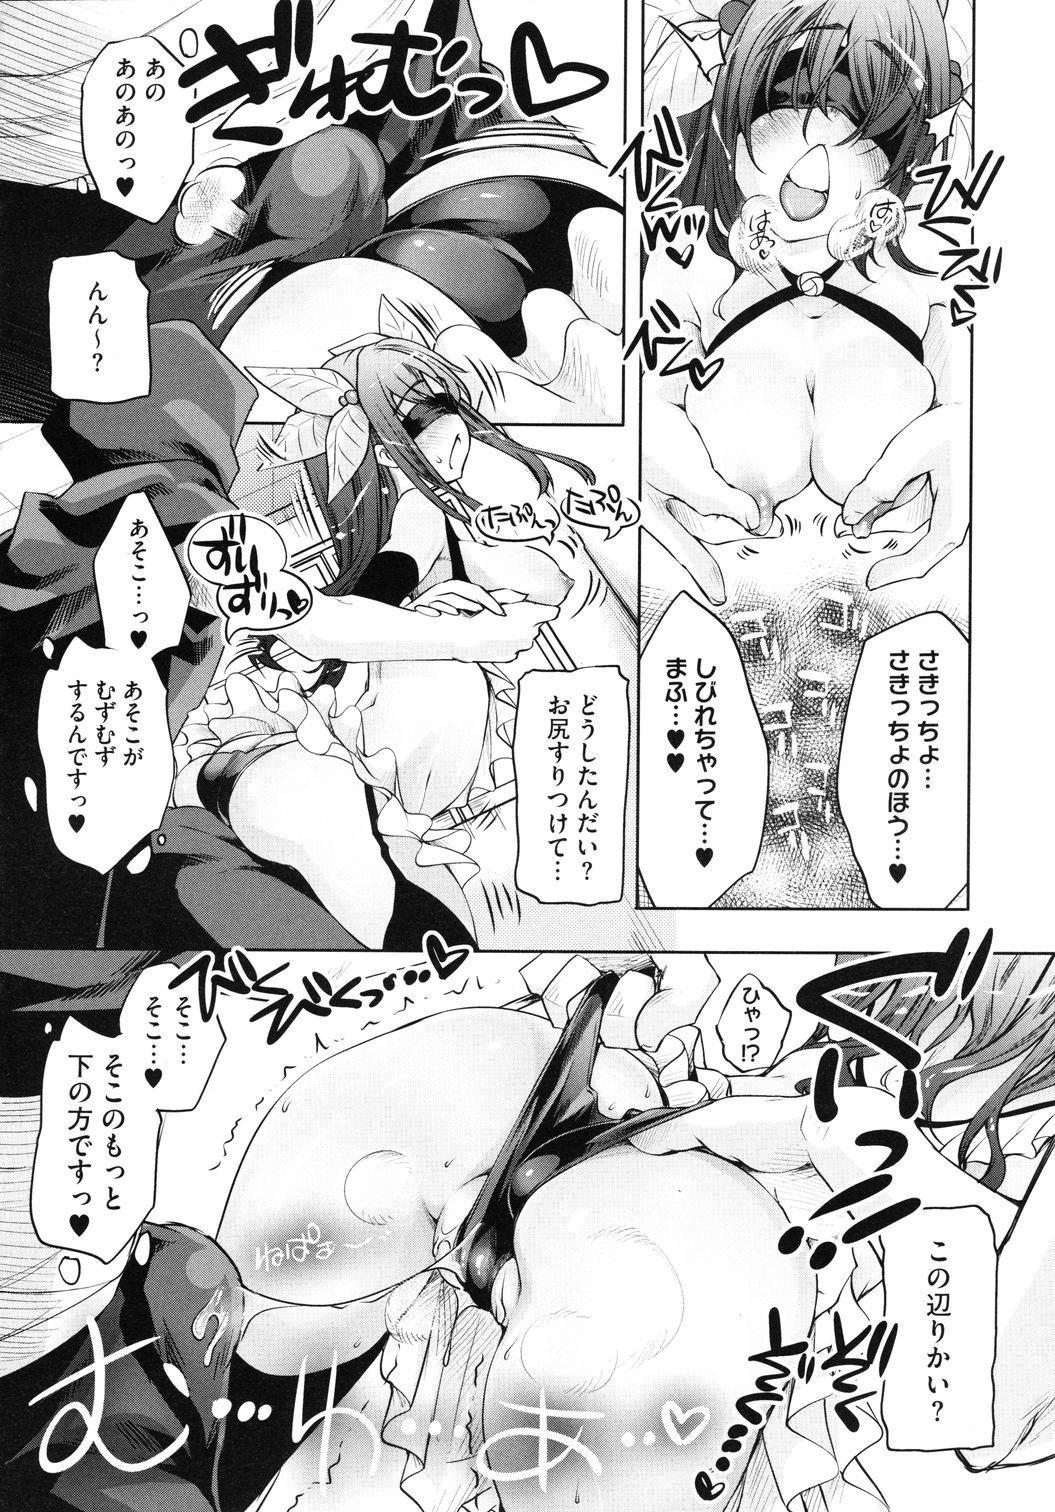 COMIC Megastore 2010-10 35